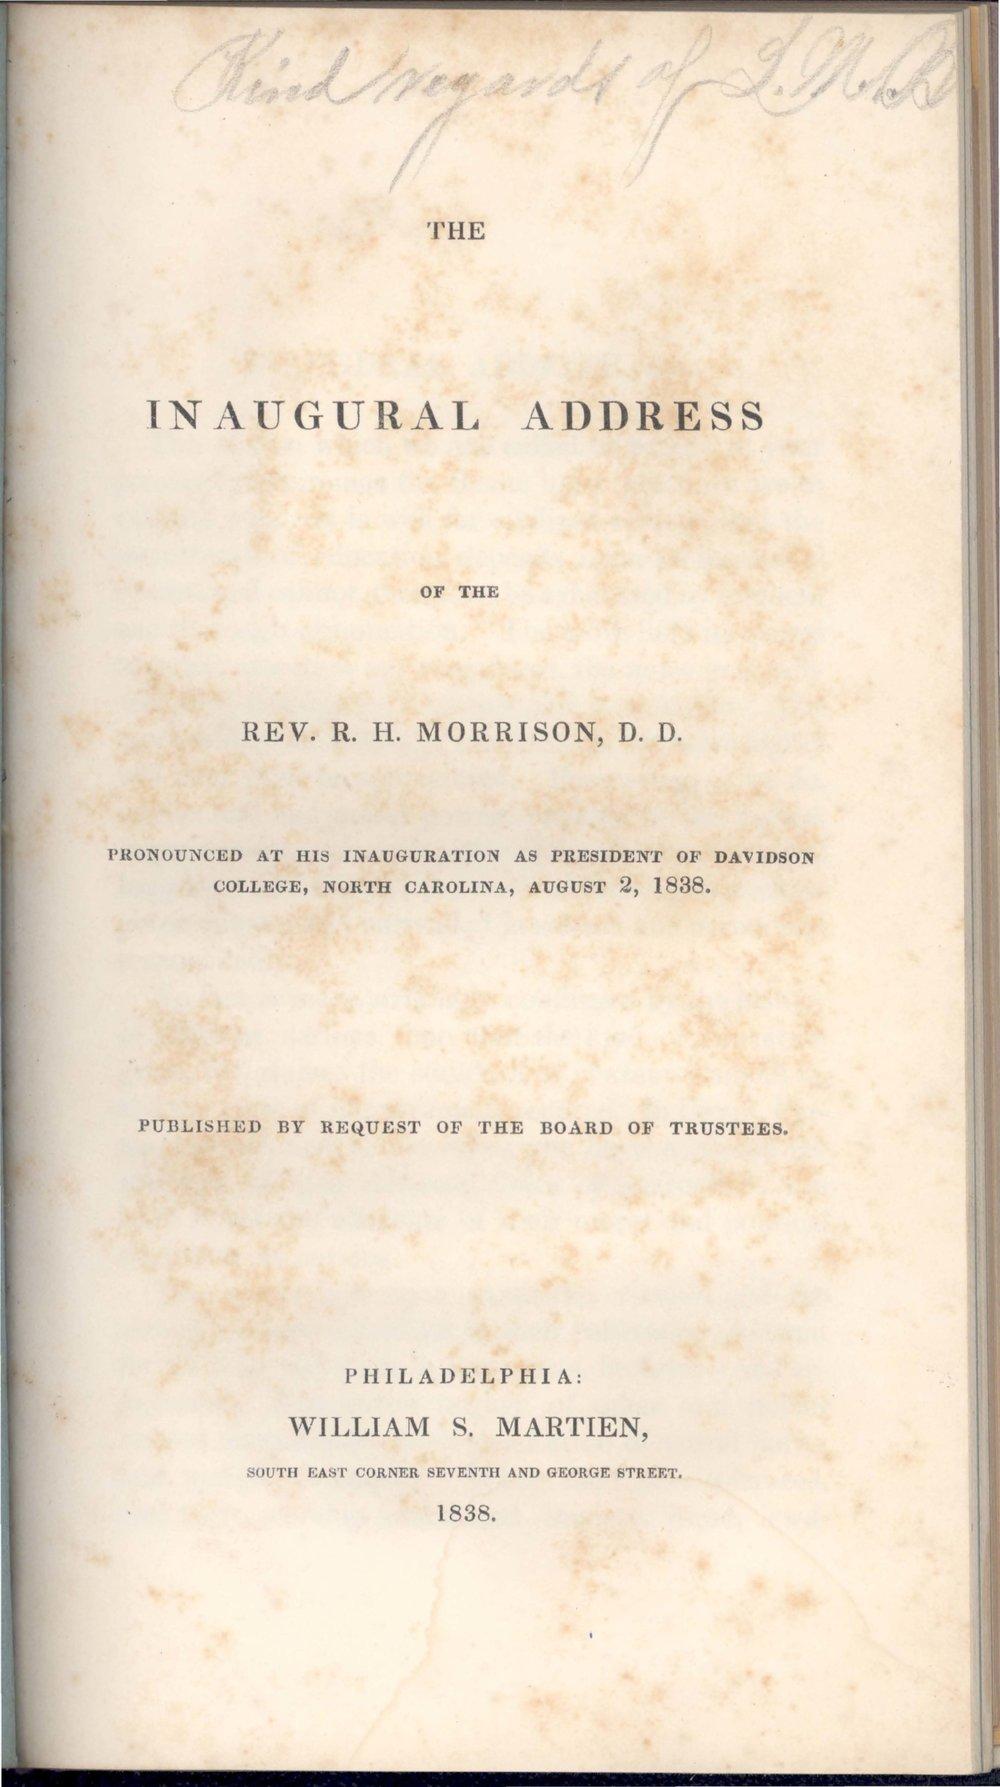 Morrison, Robert Hall, Inaugural Address Title Page.jpg